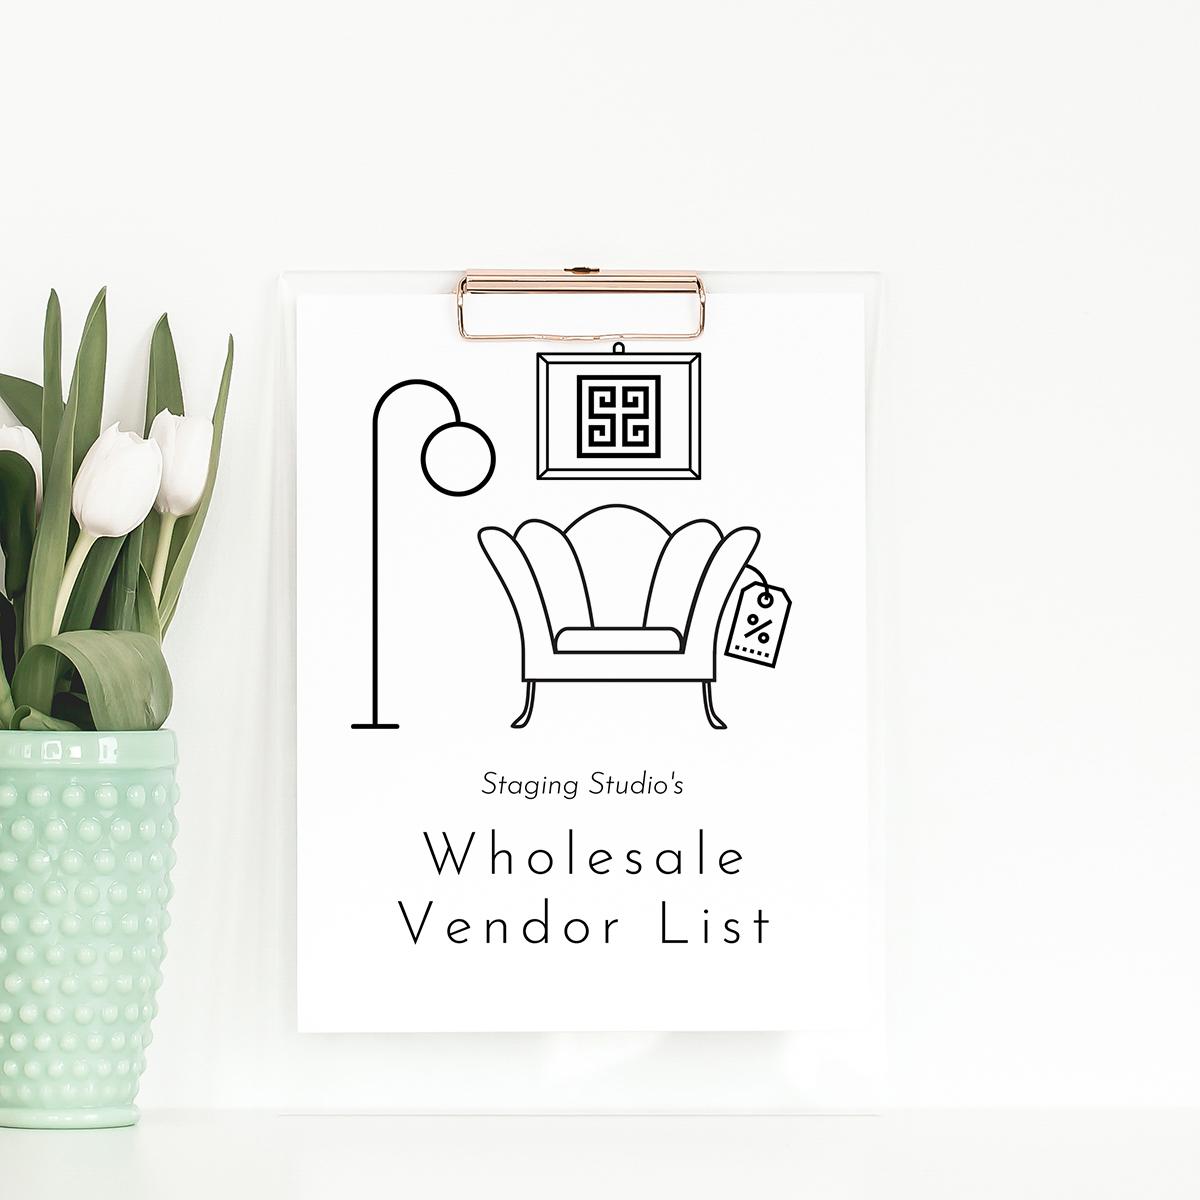 Home Staging Wholesale Vendor List Picture